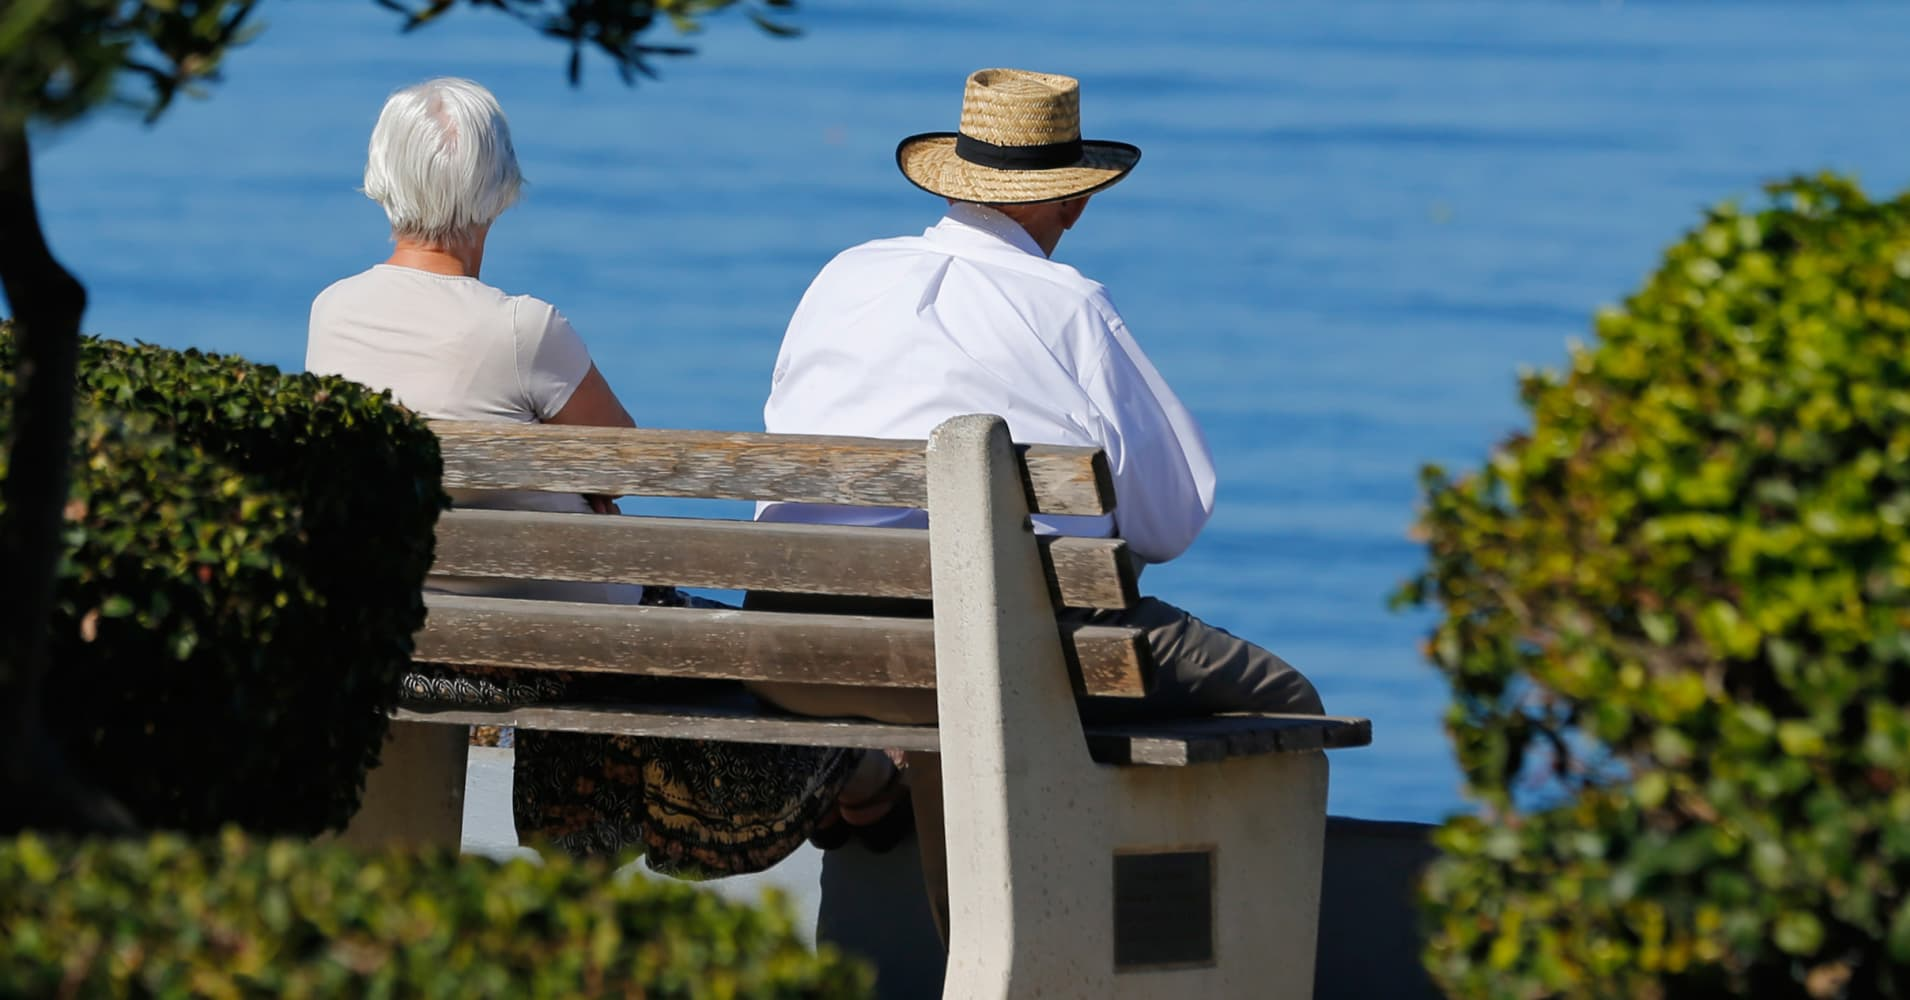 Aging population retirement